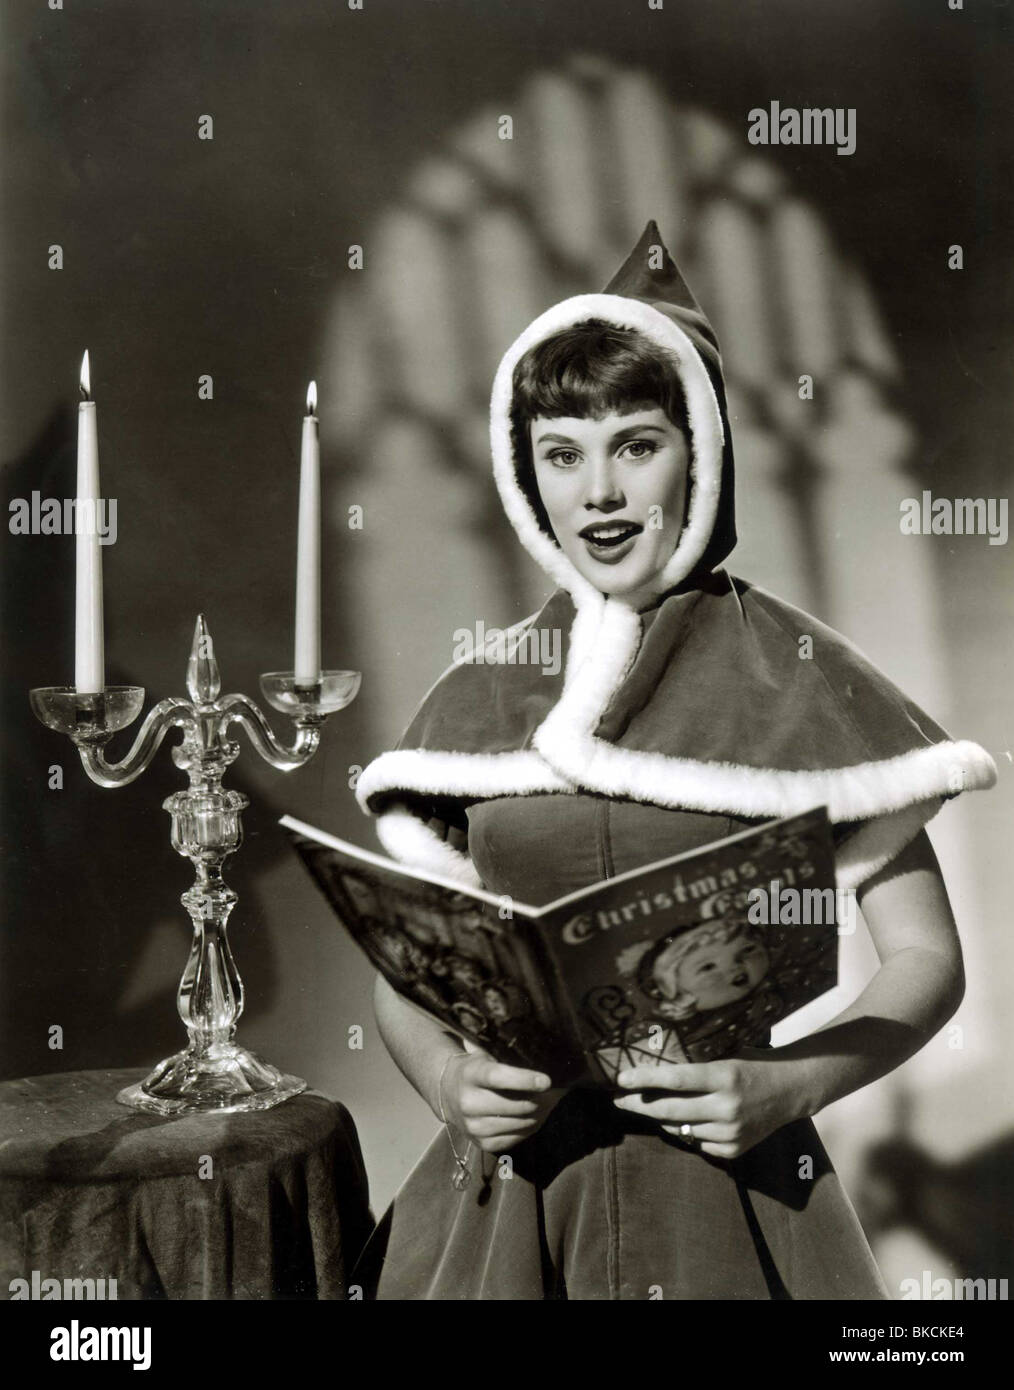 CHRISTMAS (FESTIVAL IMAGES) SUSAN STEPHEN CHRI 004P - Stock Image